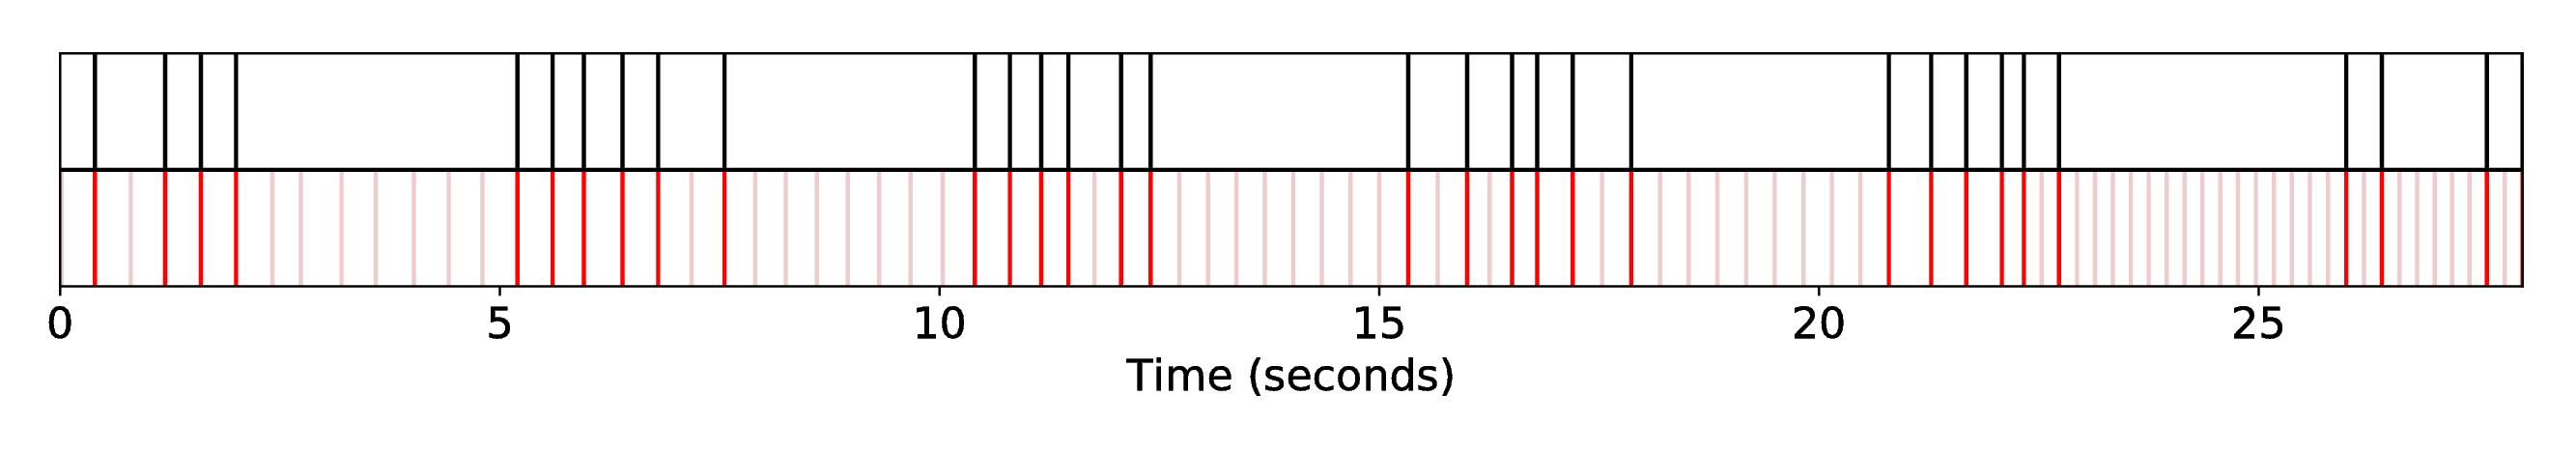 DP1_INT1_R-Syn-CoIrGa__S-Fandango__SequenceAlignment